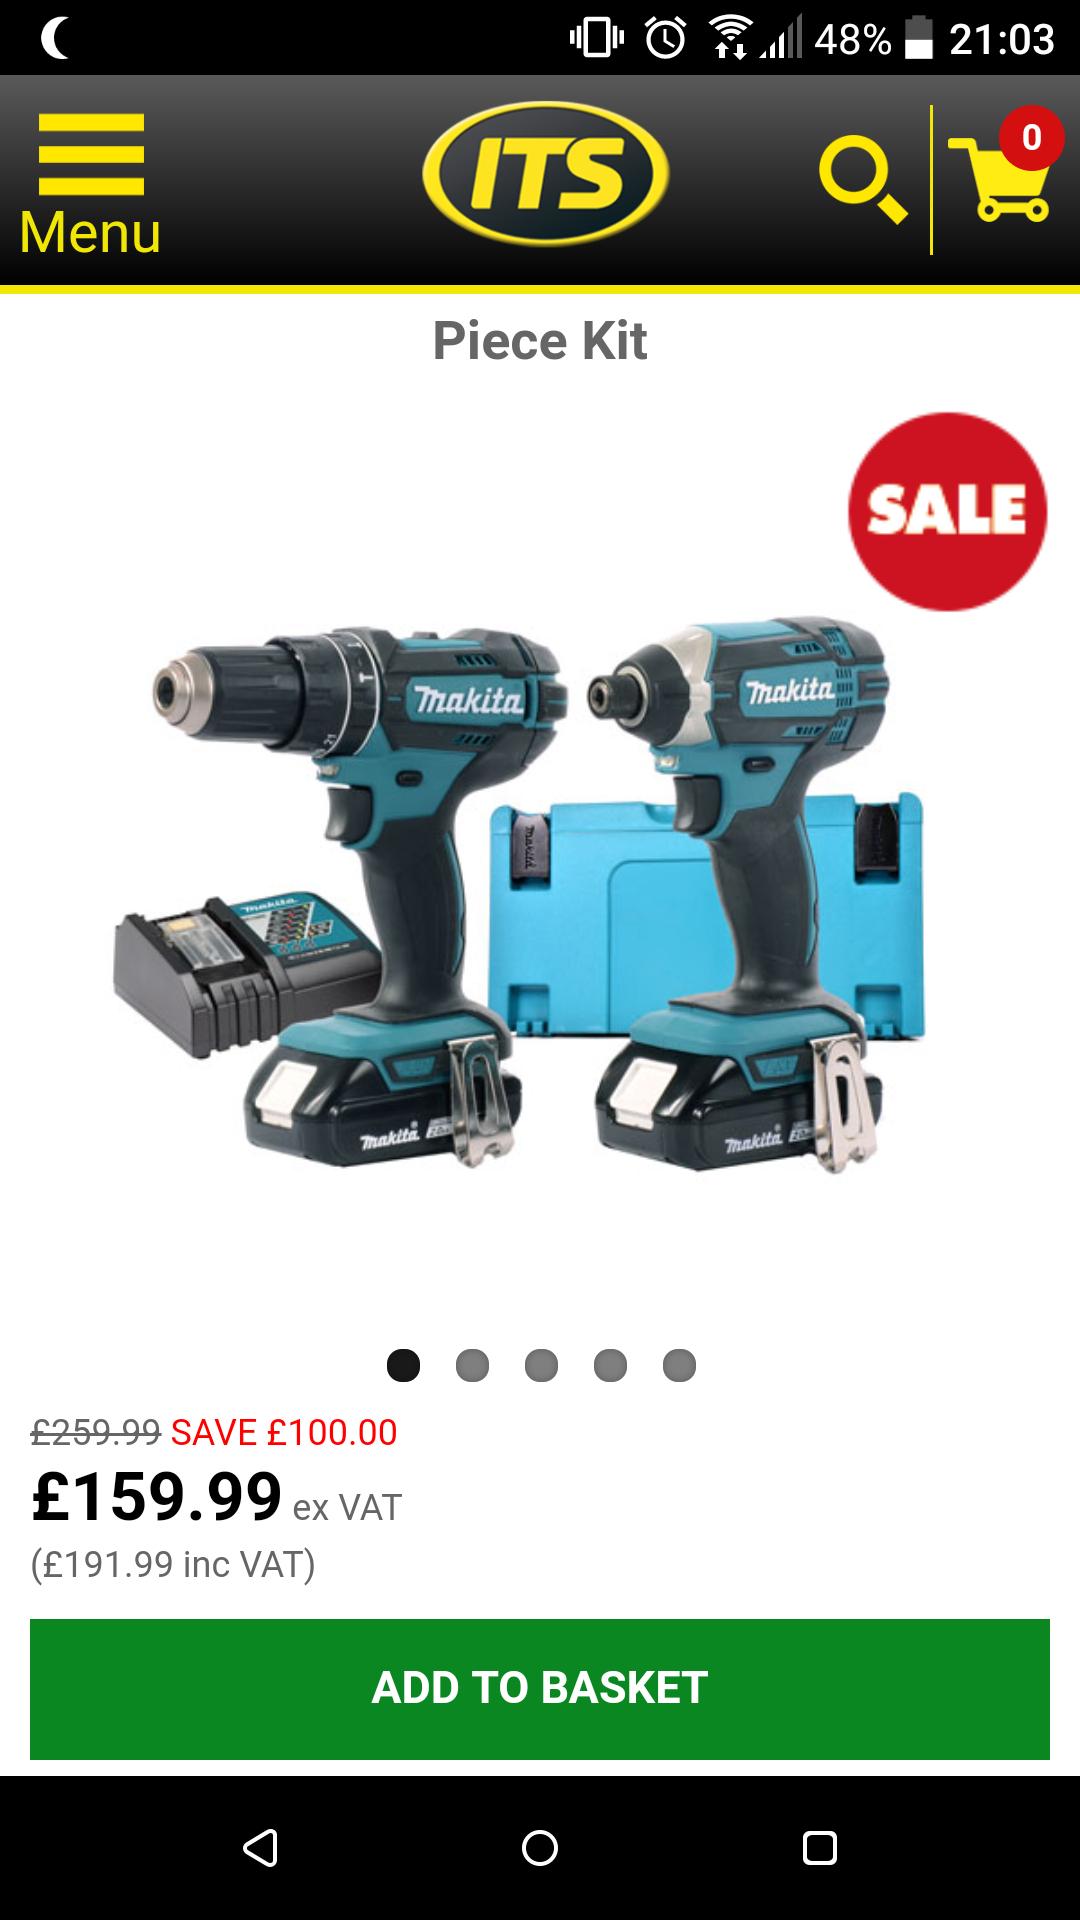 Makita DLX2KITMakita 18v Li-ion 2 Piece Kit - £159. 99 ex VAT @ ITS